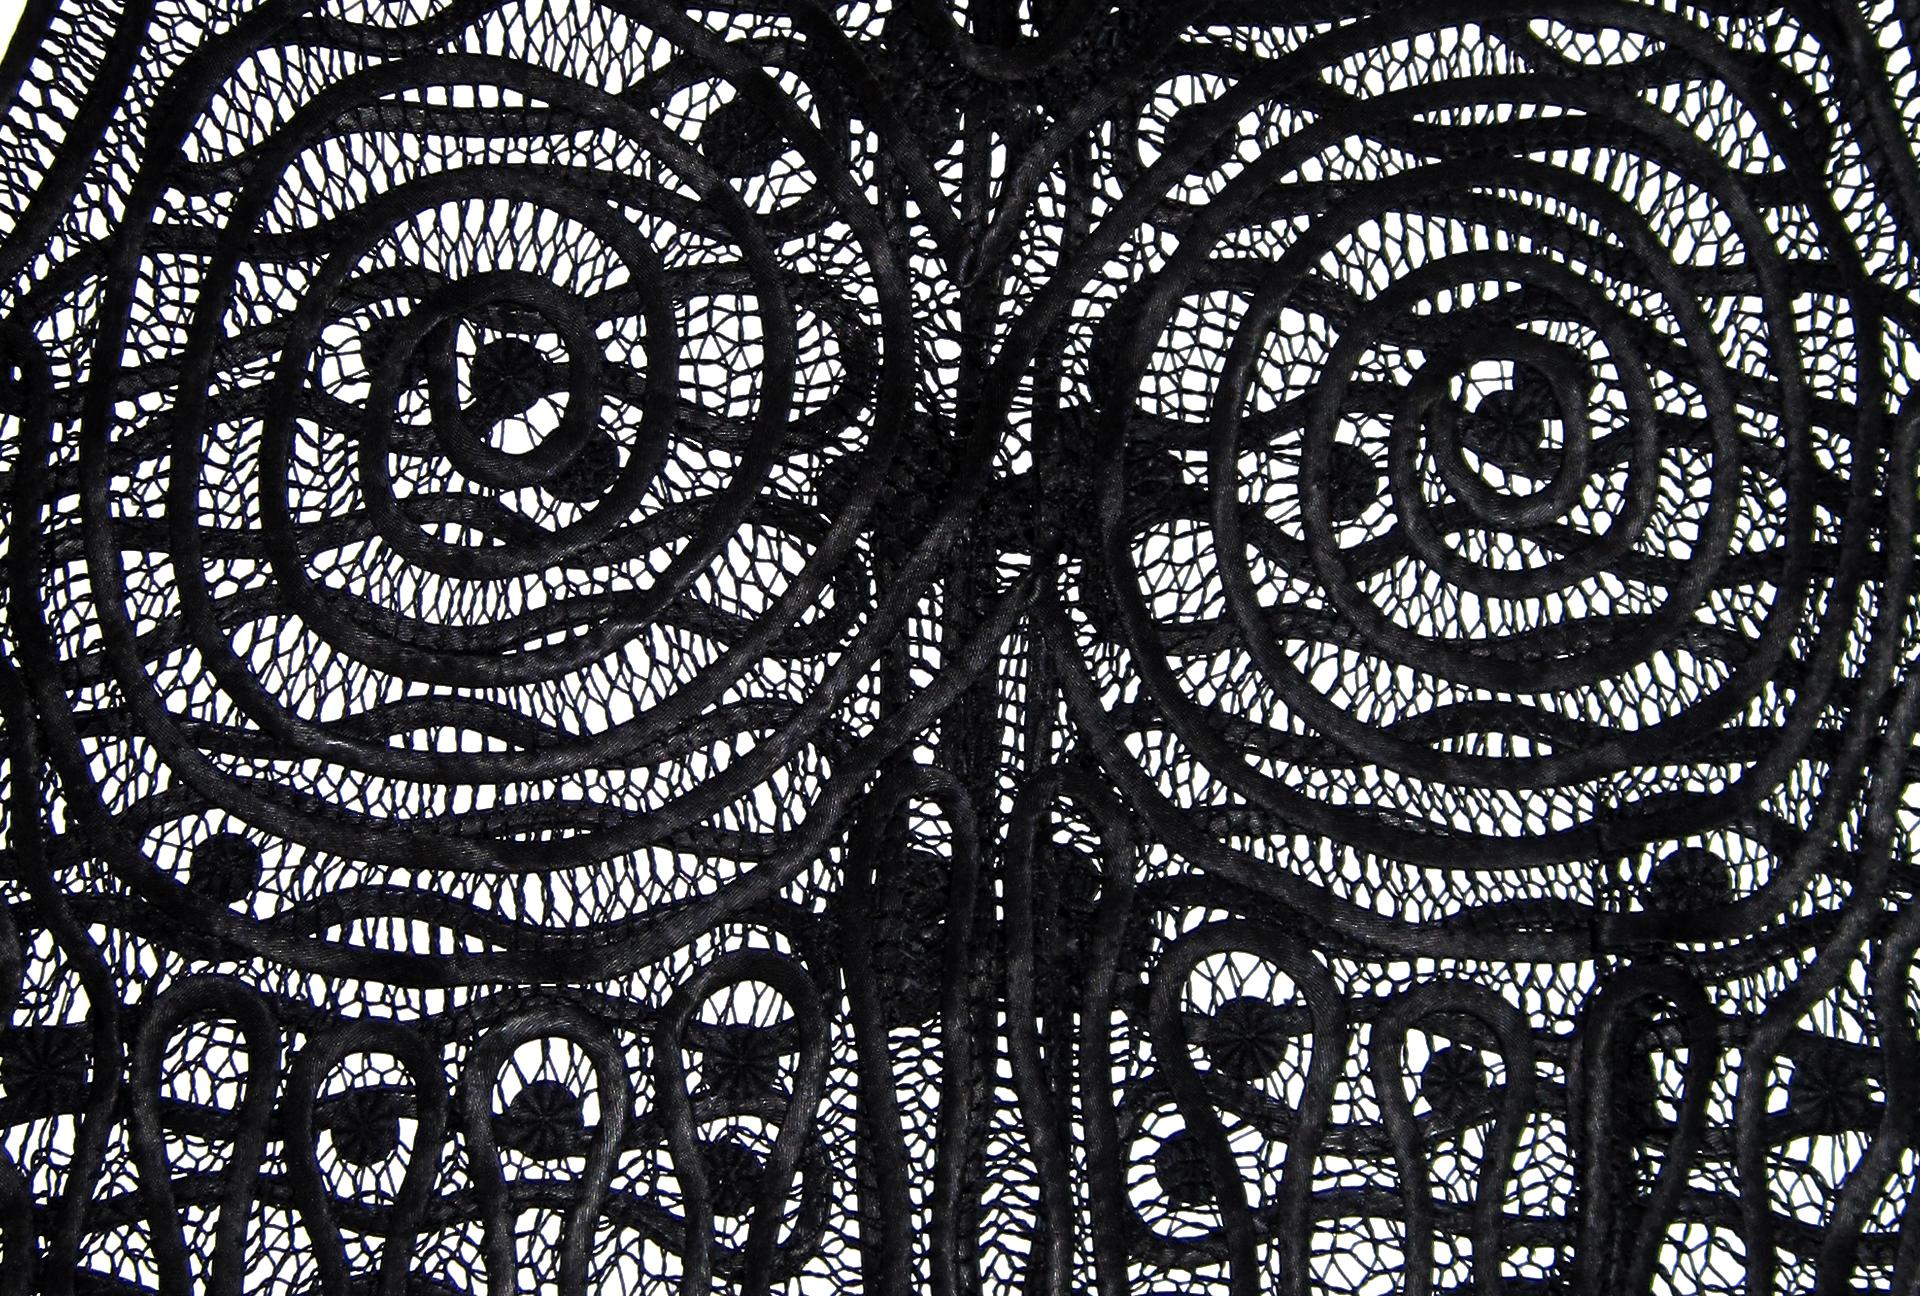 home textile design jobs homemade ftempo. Black Bedroom Furniture Sets. Home Design Ideas